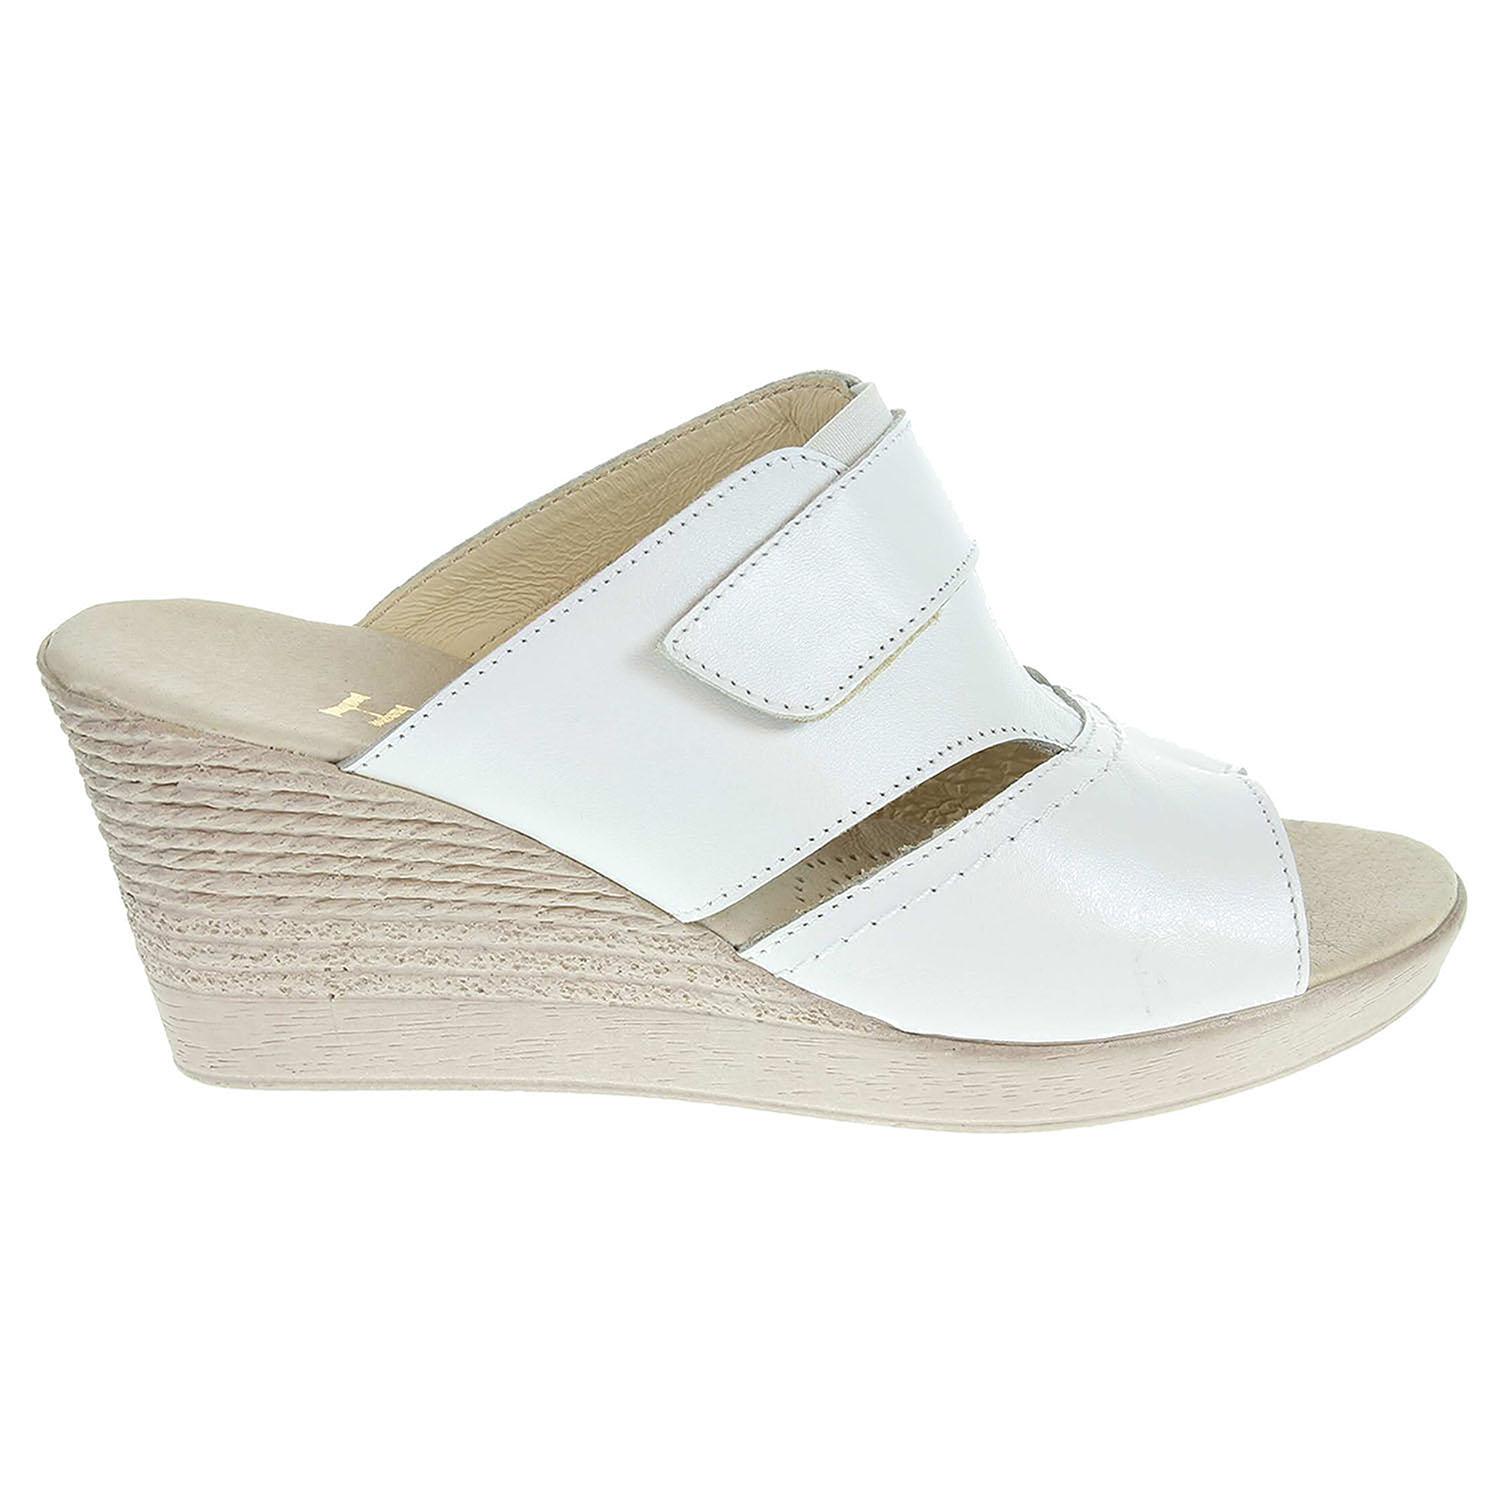 101add2d3984 Dámské pantofle J3436 bílé J3436 biela 37